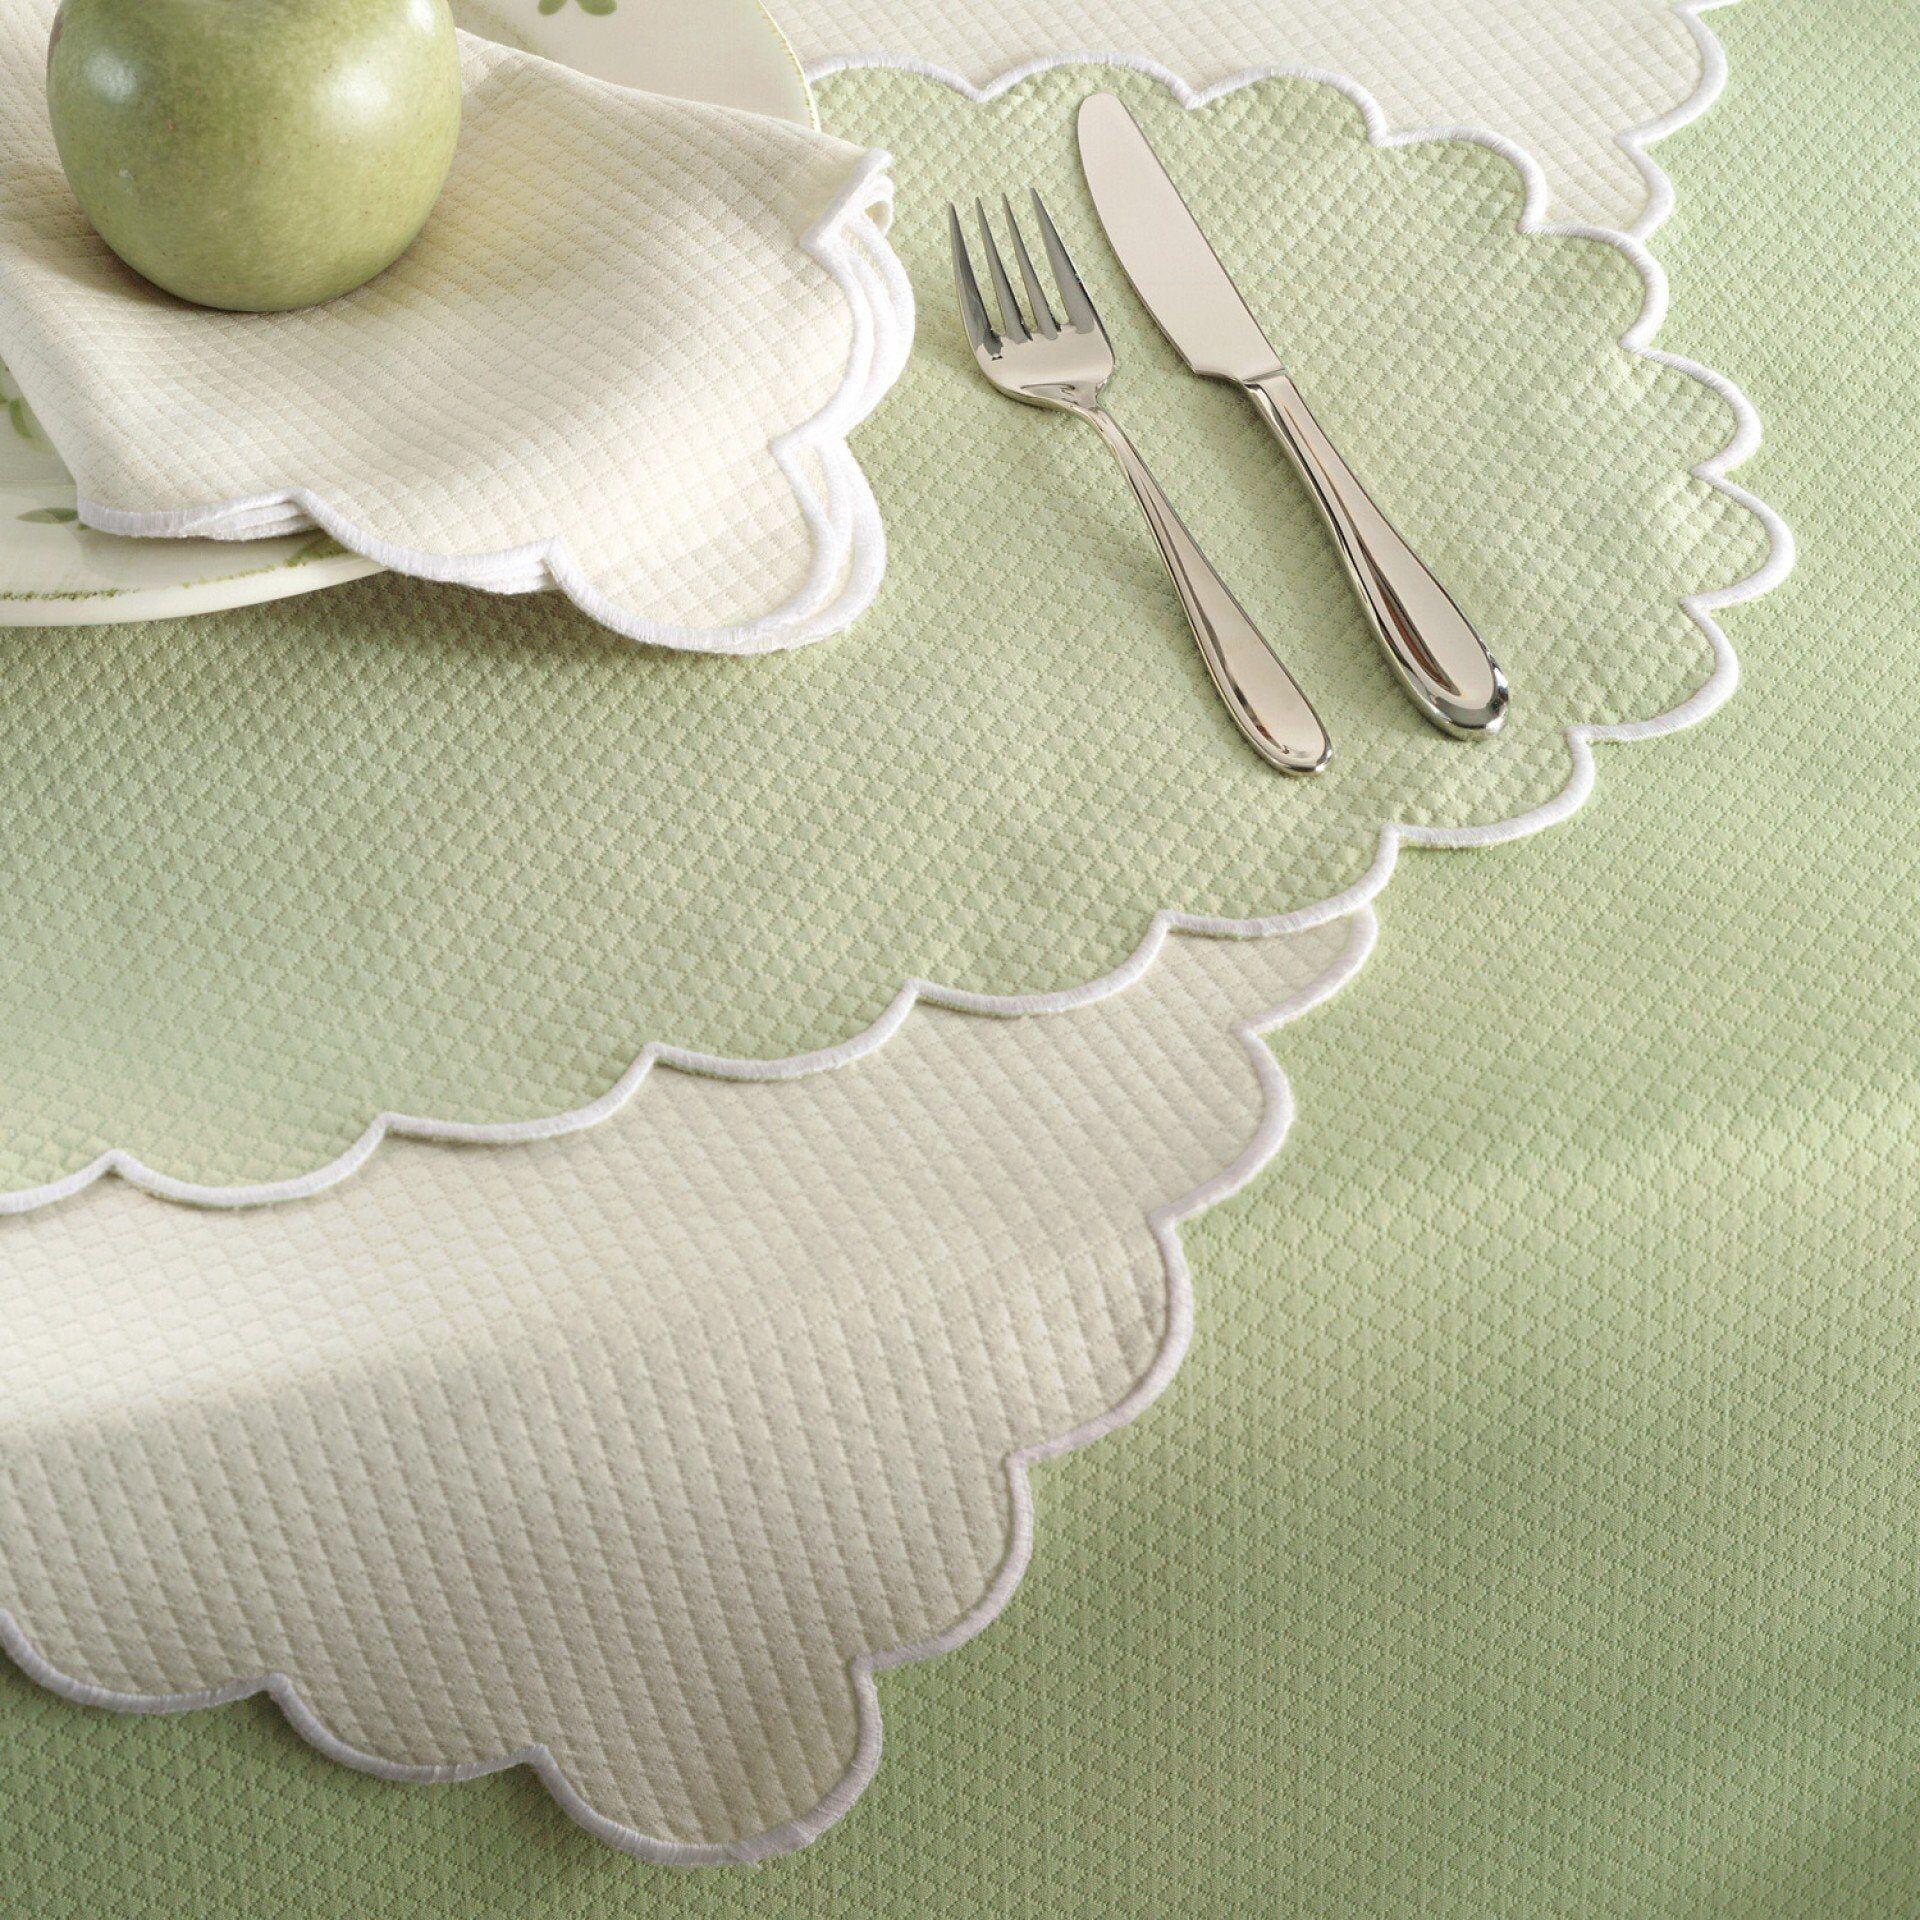 Matouk Savannah Gardens Round Tablecloths by Matouk